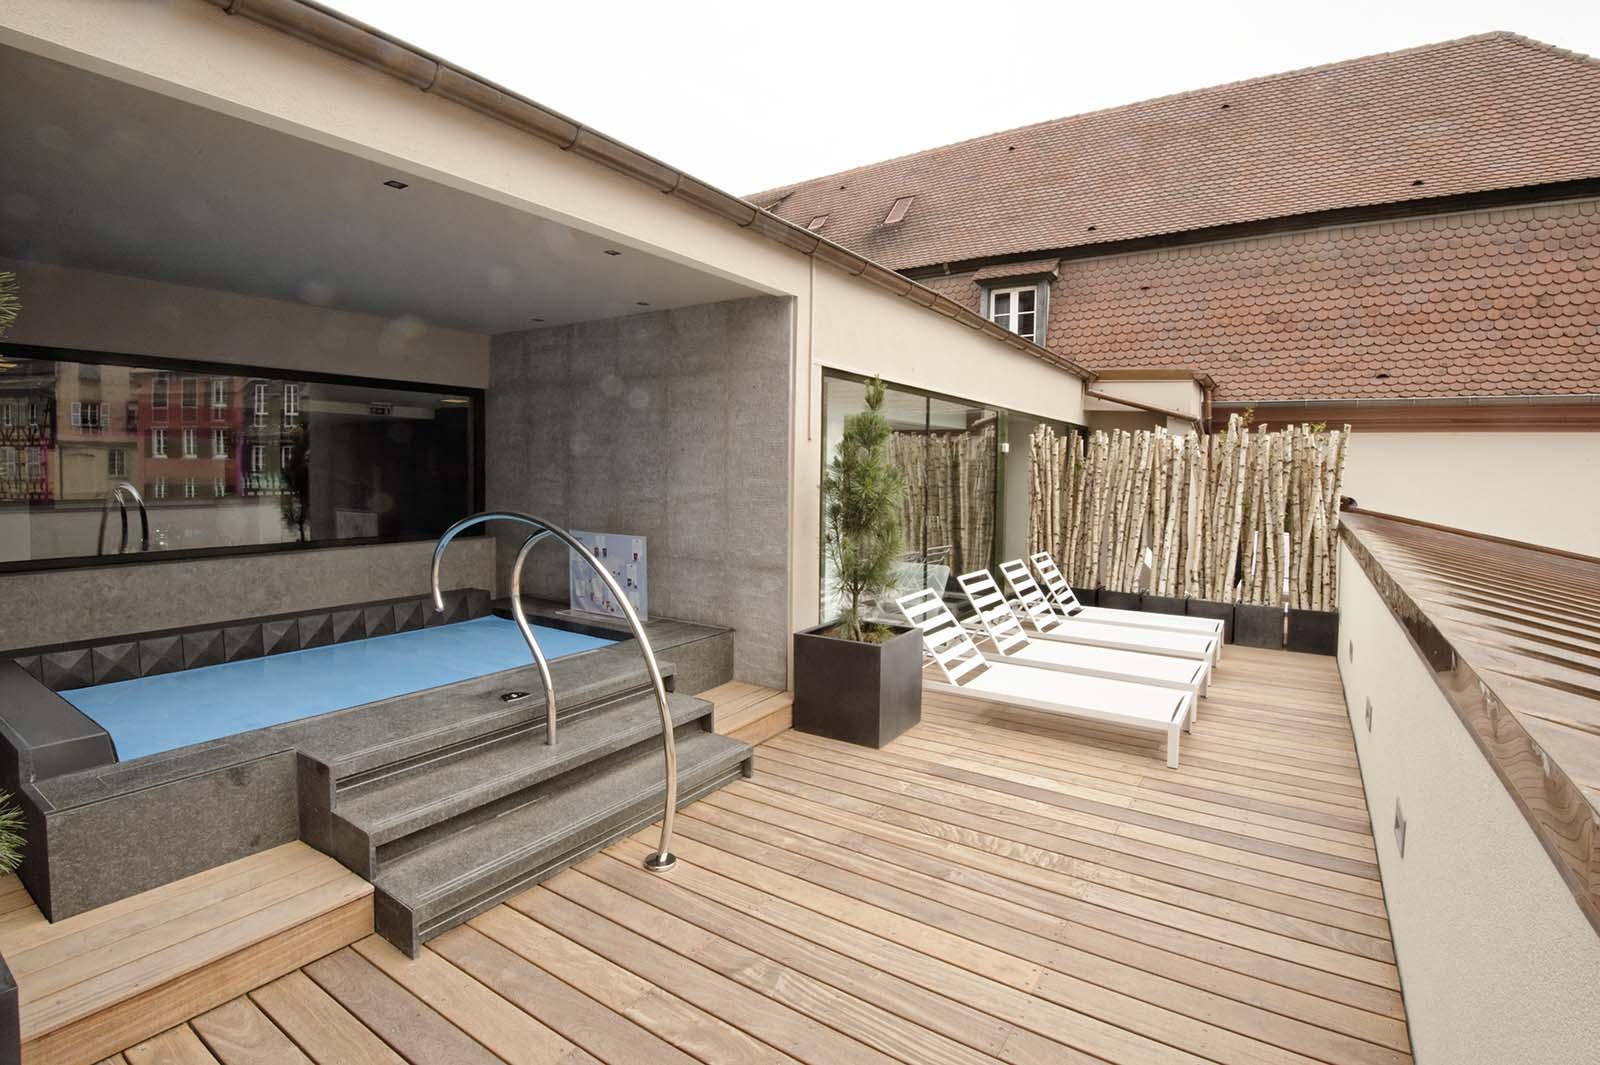 h tel r gent spa sauna hammam douche petite france strasbourg point eco alsace. Black Bedroom Furniture Sets. Home Design Ideas